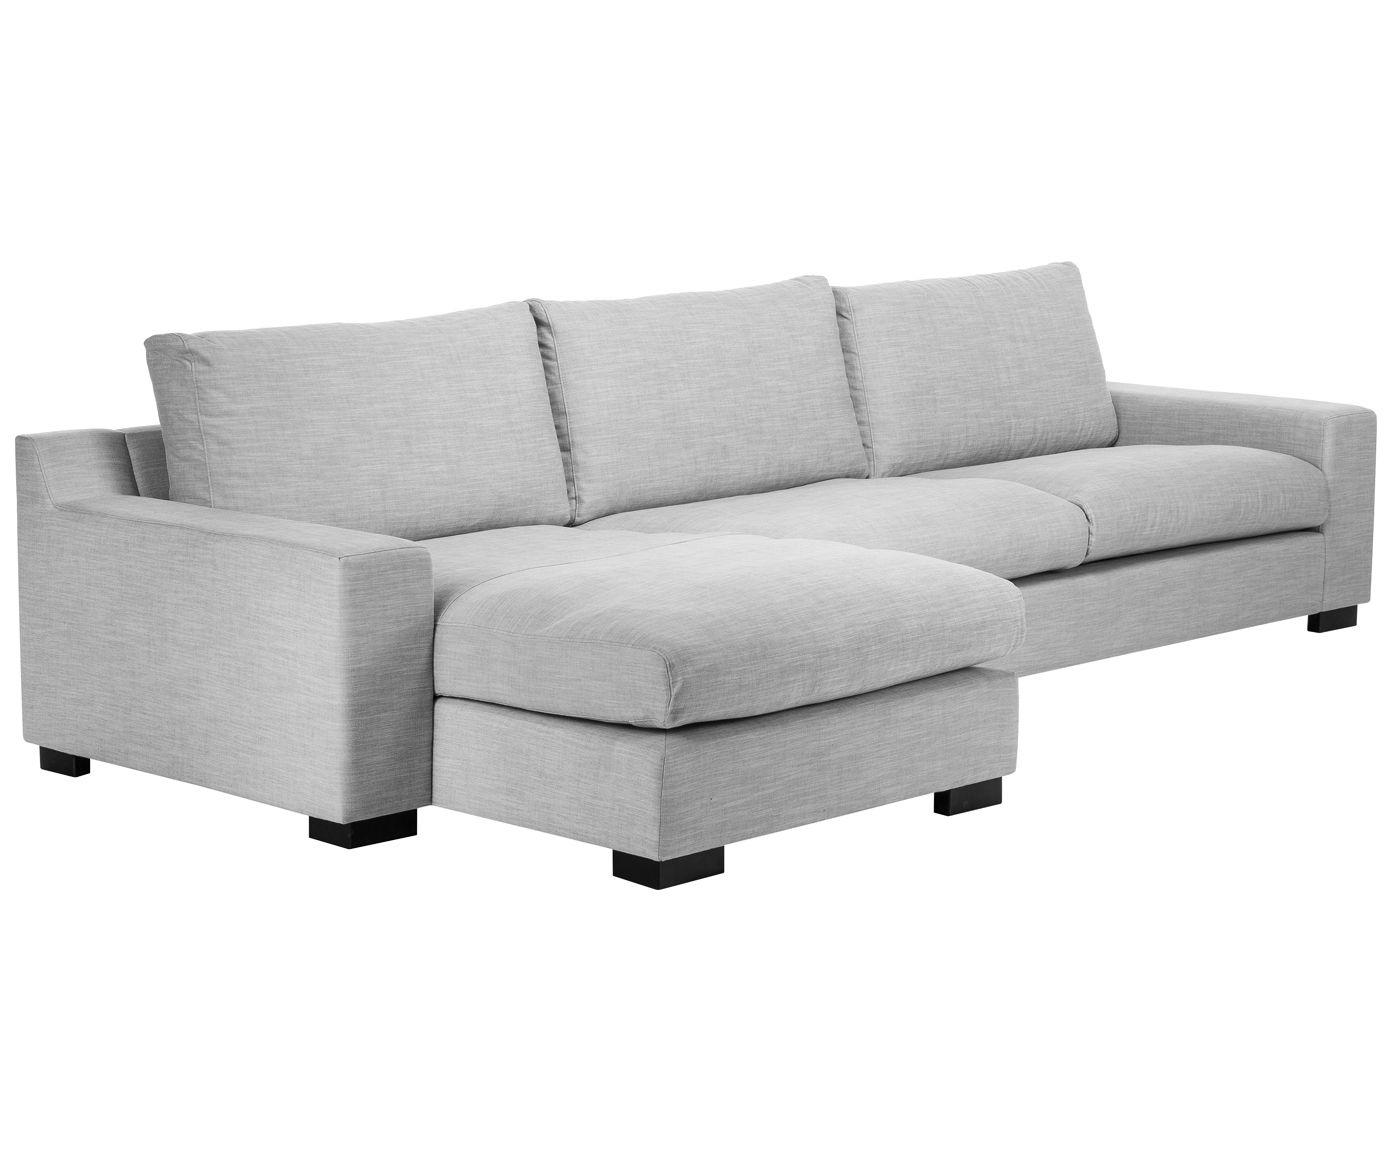 Sofa RELAX - Baumwolle/Leinen/Holz WestwingNow | WestwingNow | 151 ...